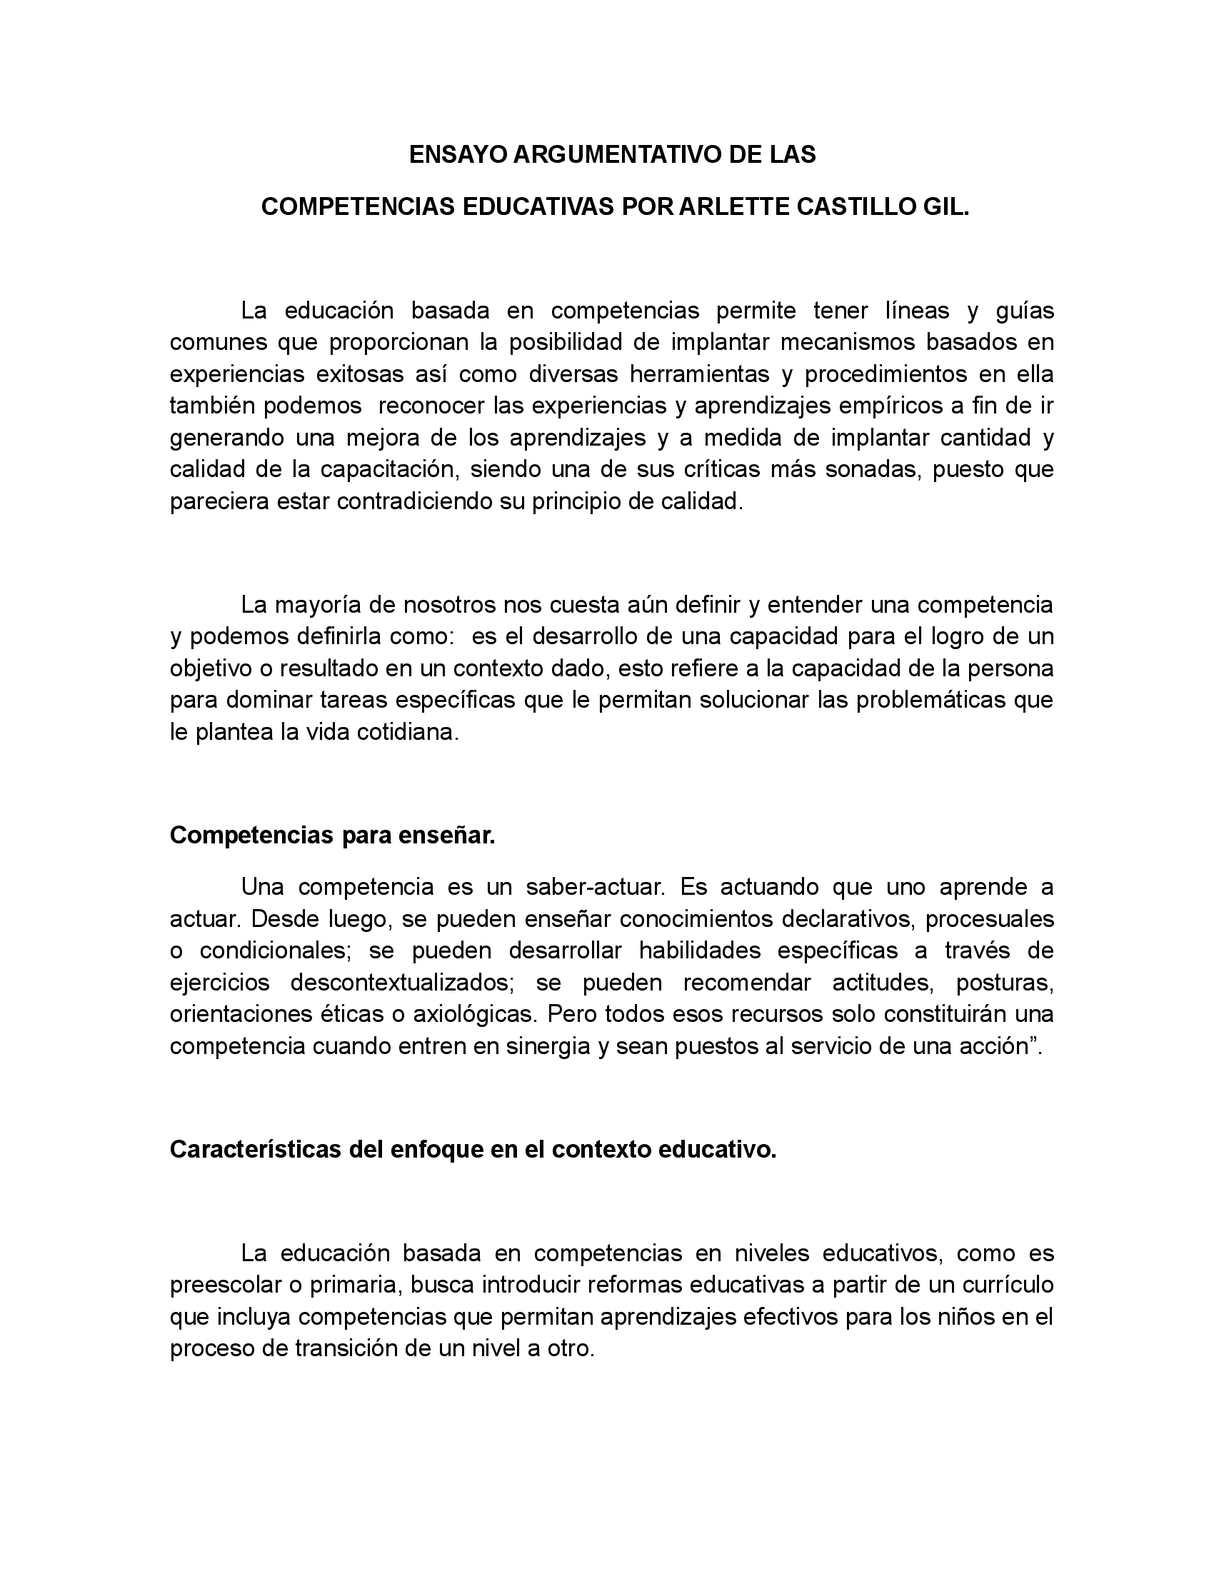 Calaméo - ensayo argumentativo competencias